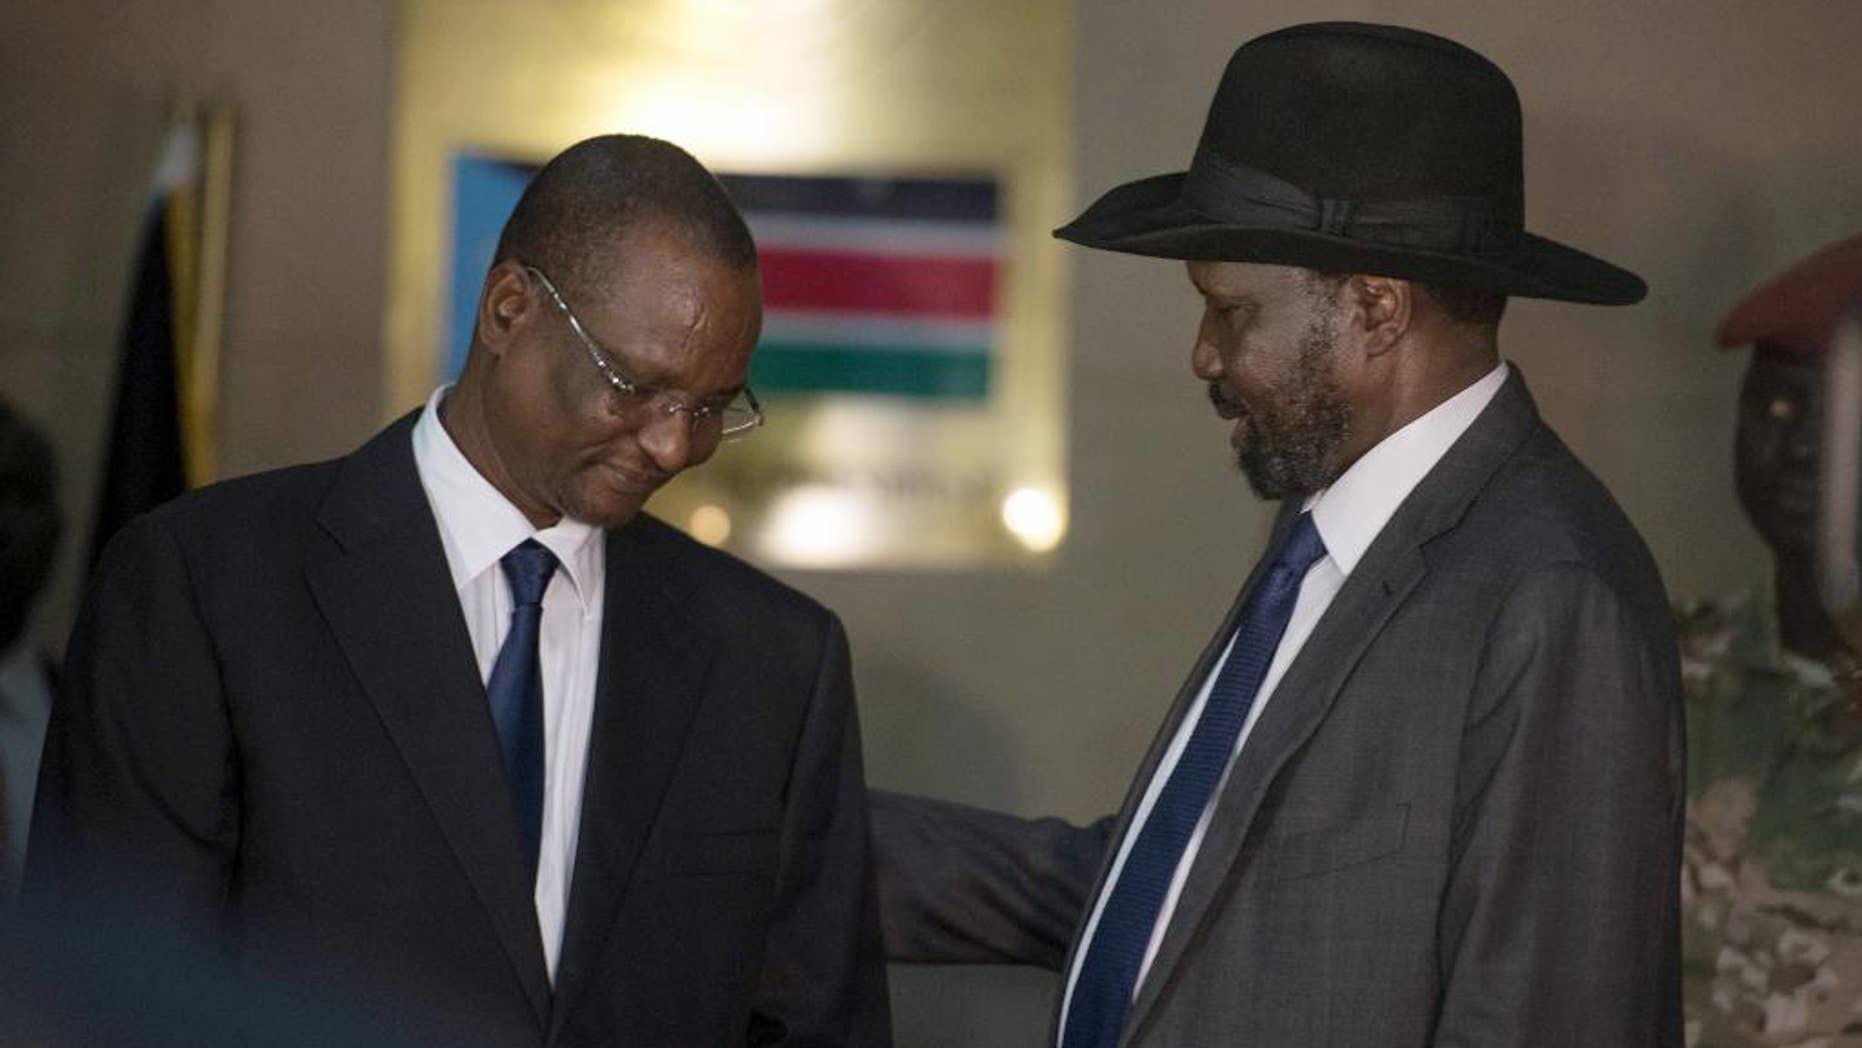 South Sudan's First Vice President Taban Deng Gai, left, speaks with President Salva Kiir, right.